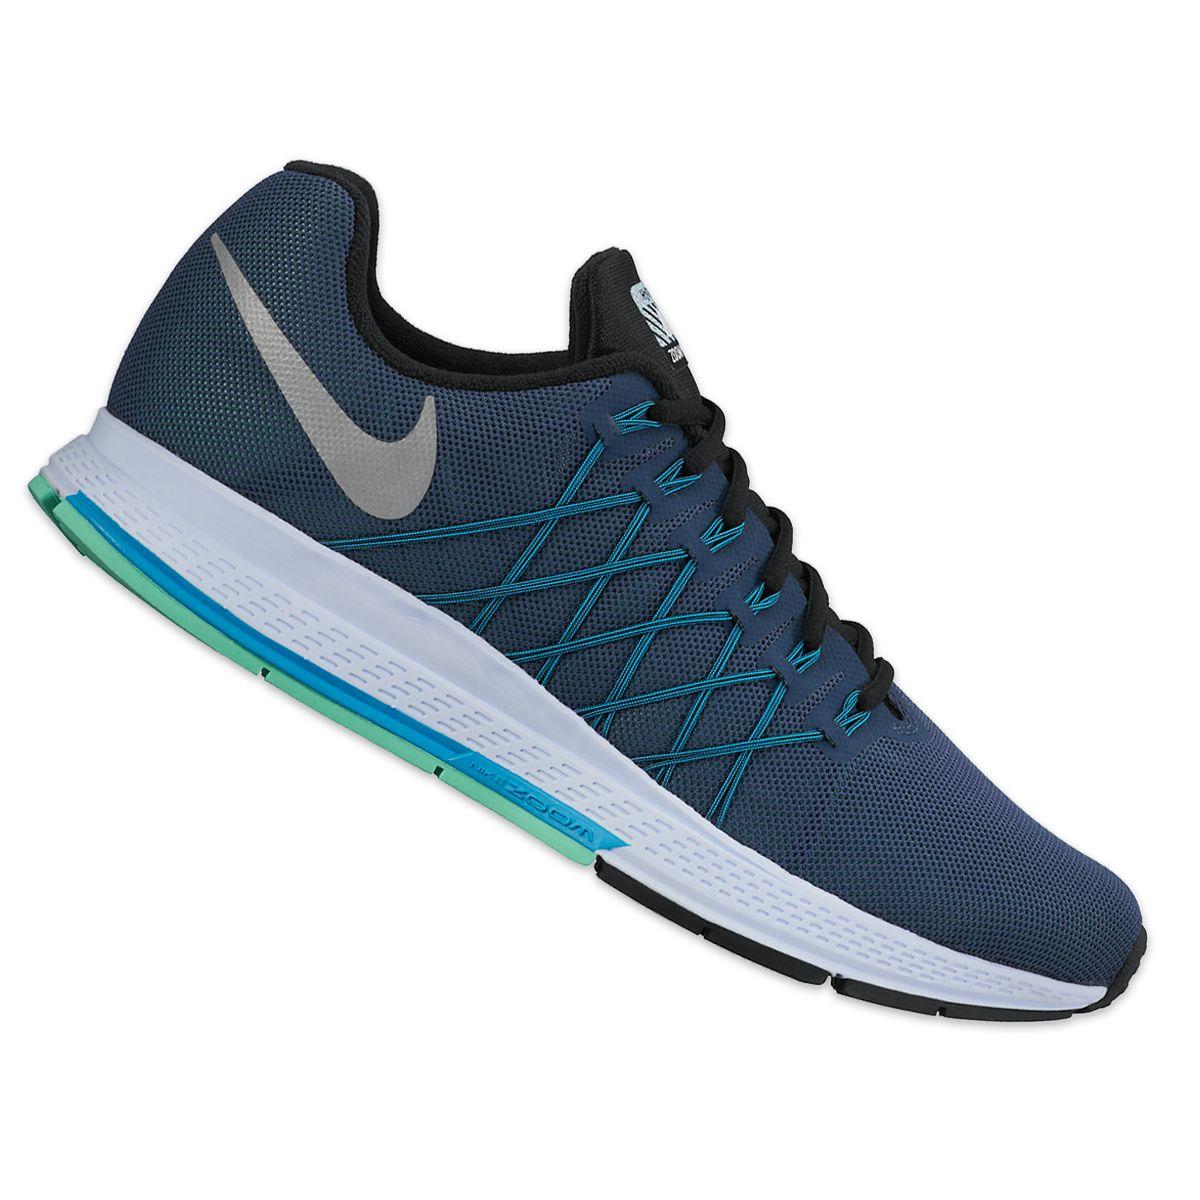 énorme réduction 1a97a c7b72 Nike Zoom Pegasus 32 Flash Mens - $159.99 CDN When you need ...